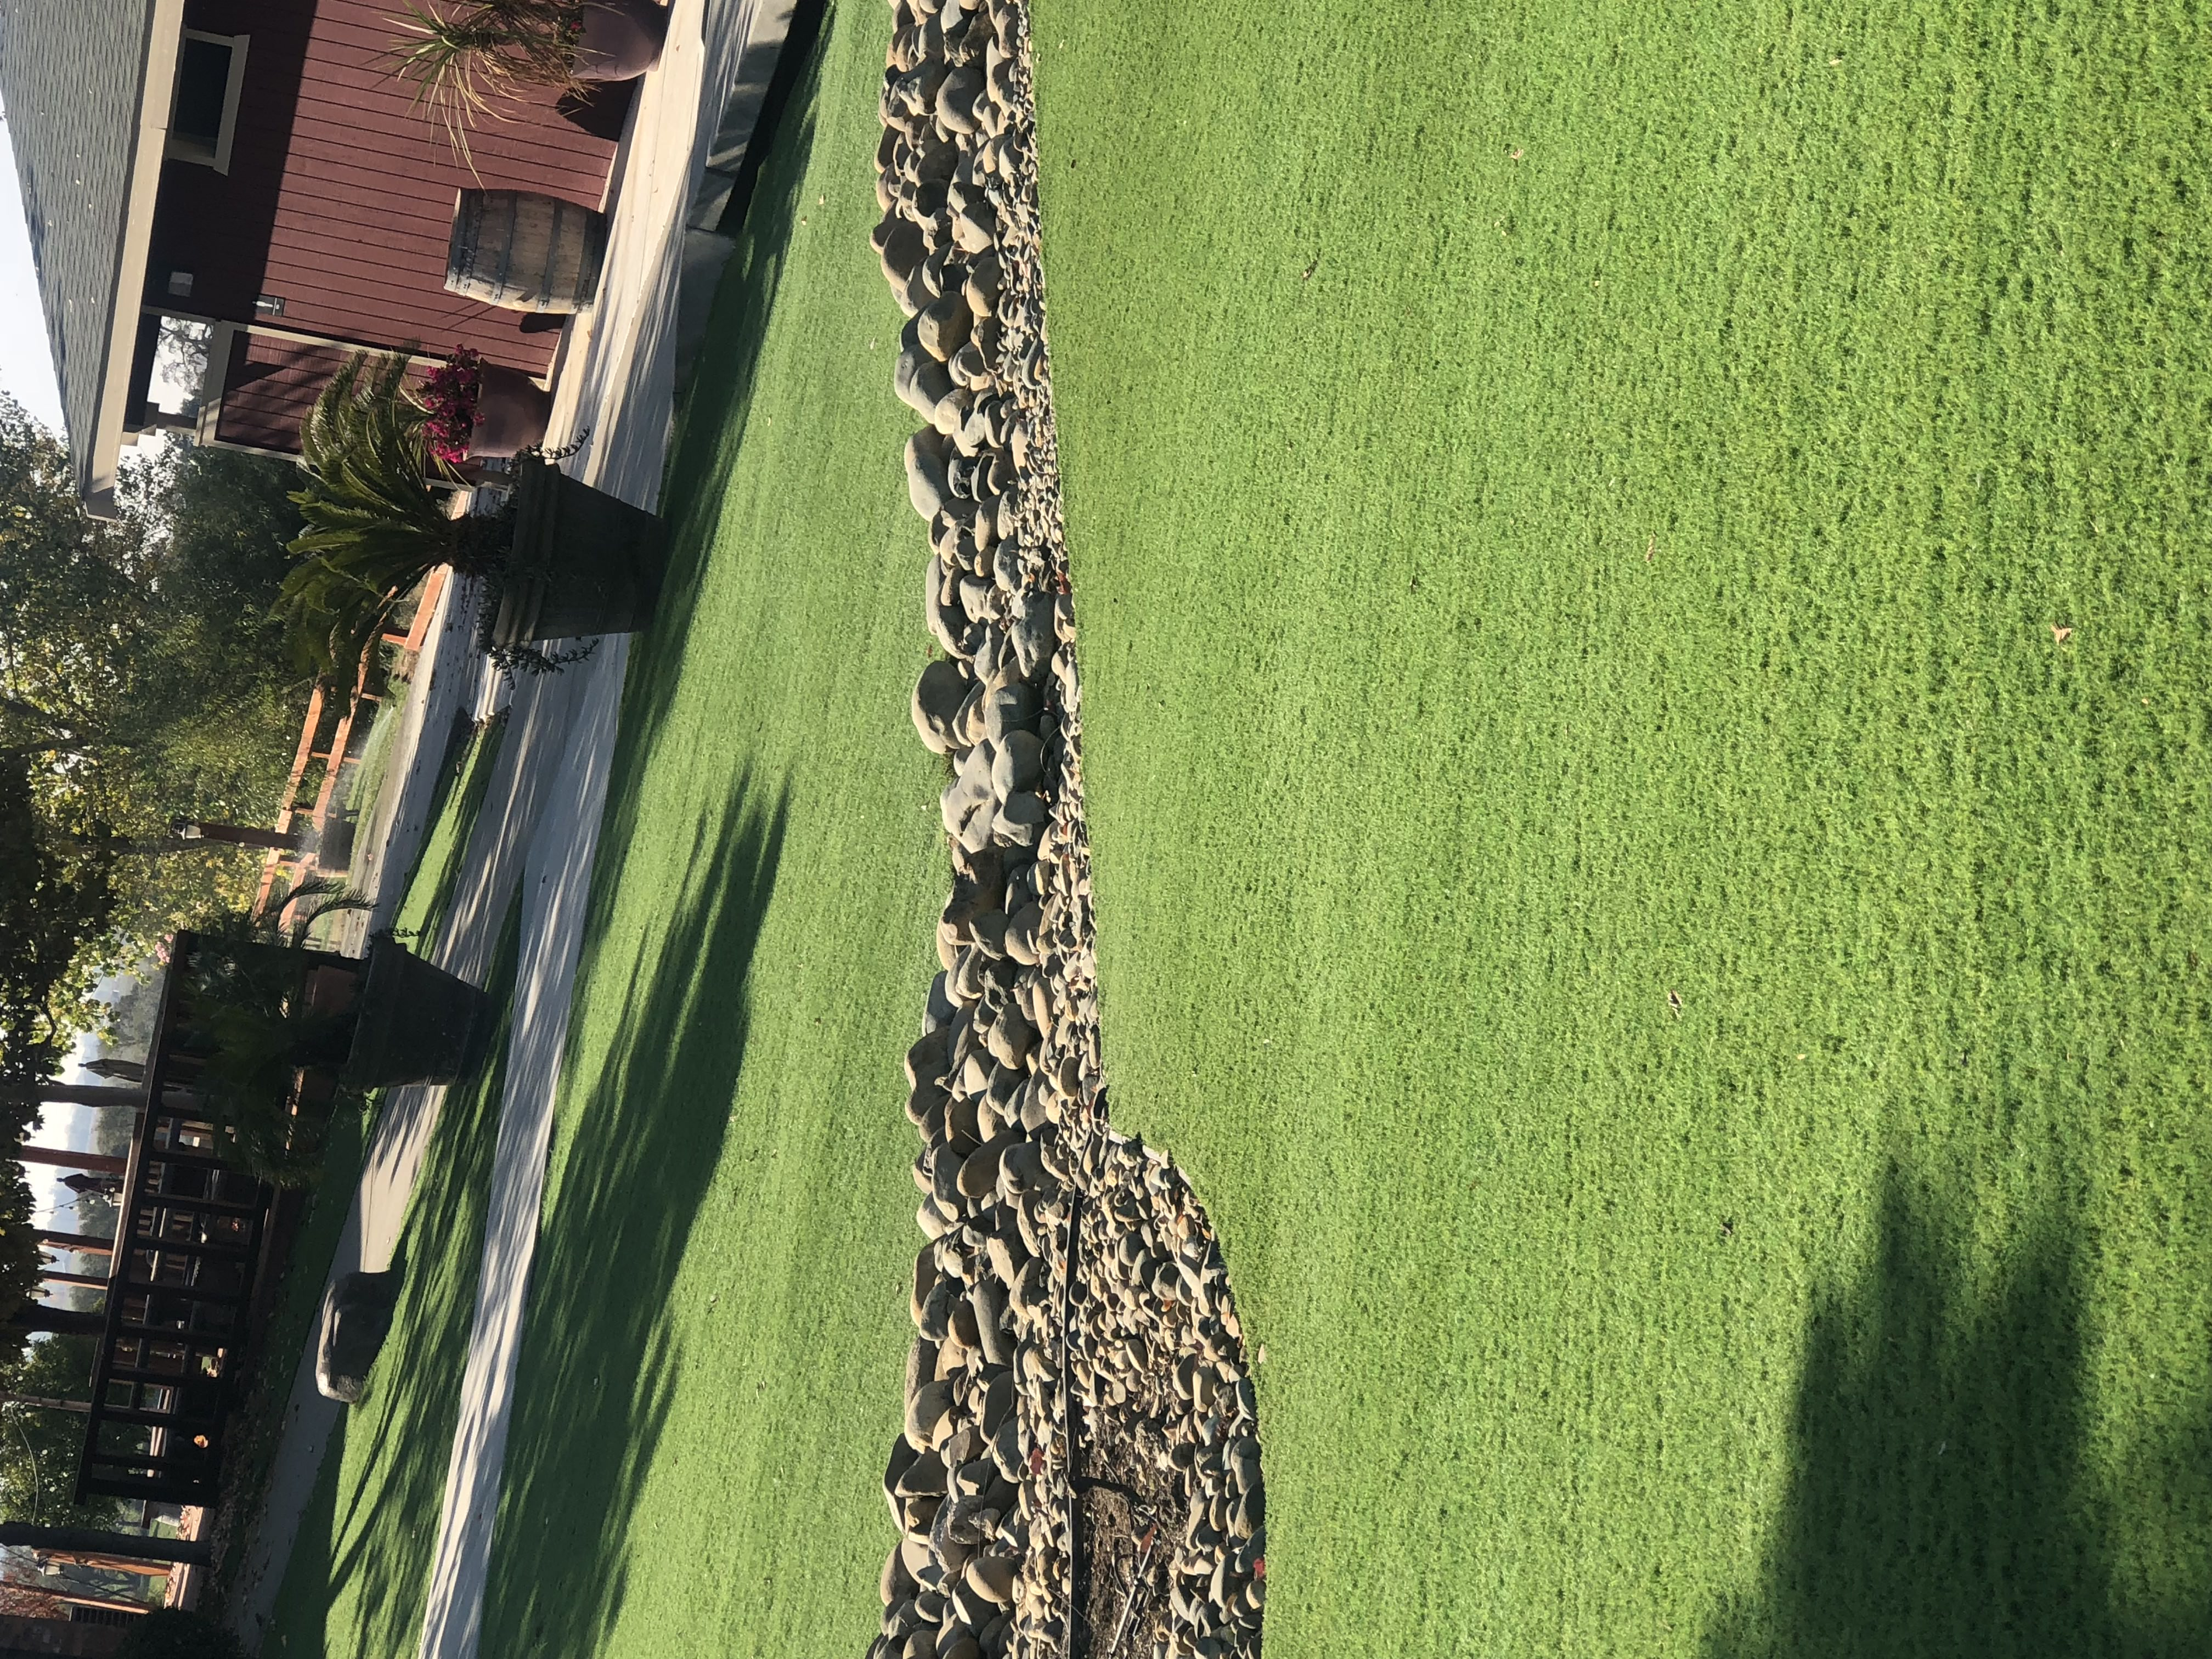 S Blade-90 high quality artificial grass,high quality artificial grass,residential landscaping,artificial turf residential,residential landscape,residential turf,residential artificial grass,backyard turf,turf backyard,fake grass for backyard,fake grass backyard,artificial grass backyard